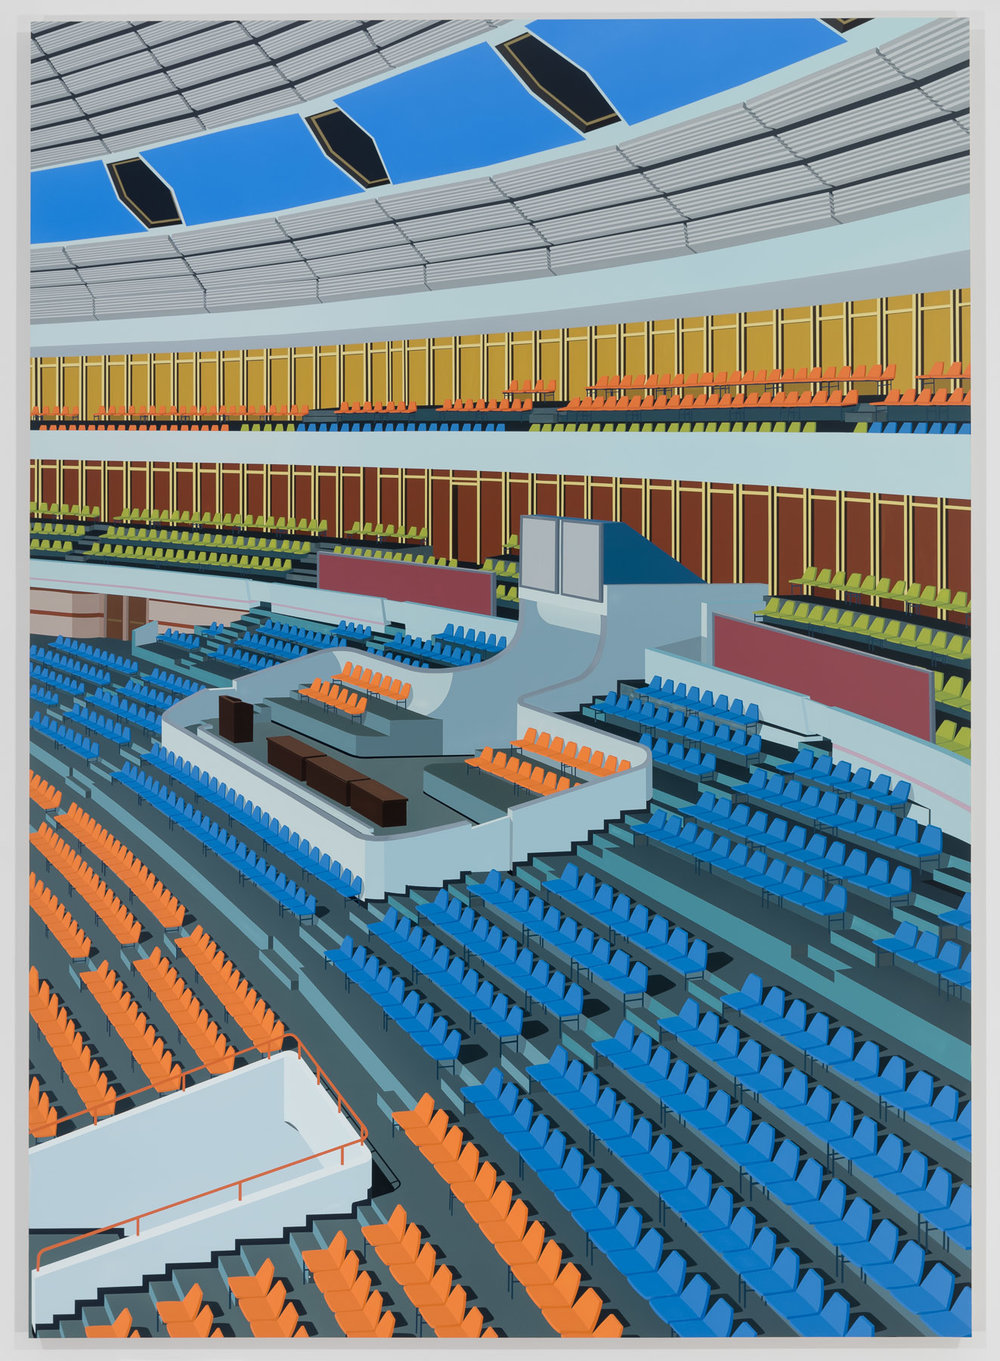 Stadium, Pyongyang, 2018 acrylic on Dibond 84 x 60 inches (213.4 x 152.4 cm)